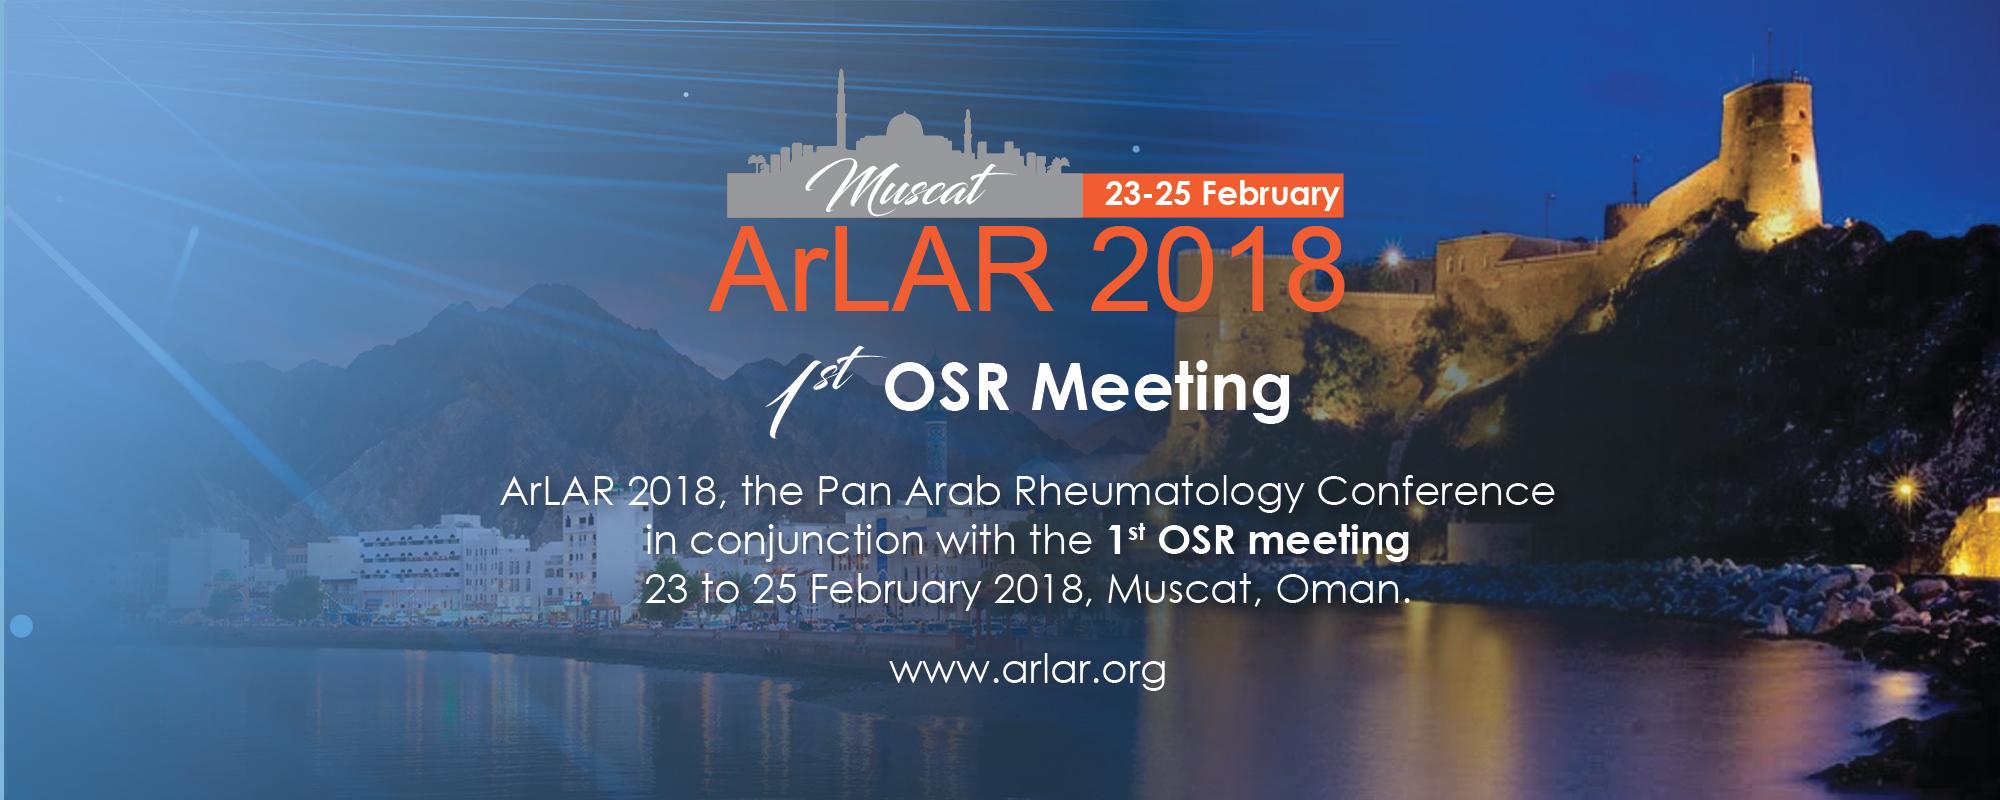 ArLAr-2018_banner_banner-01